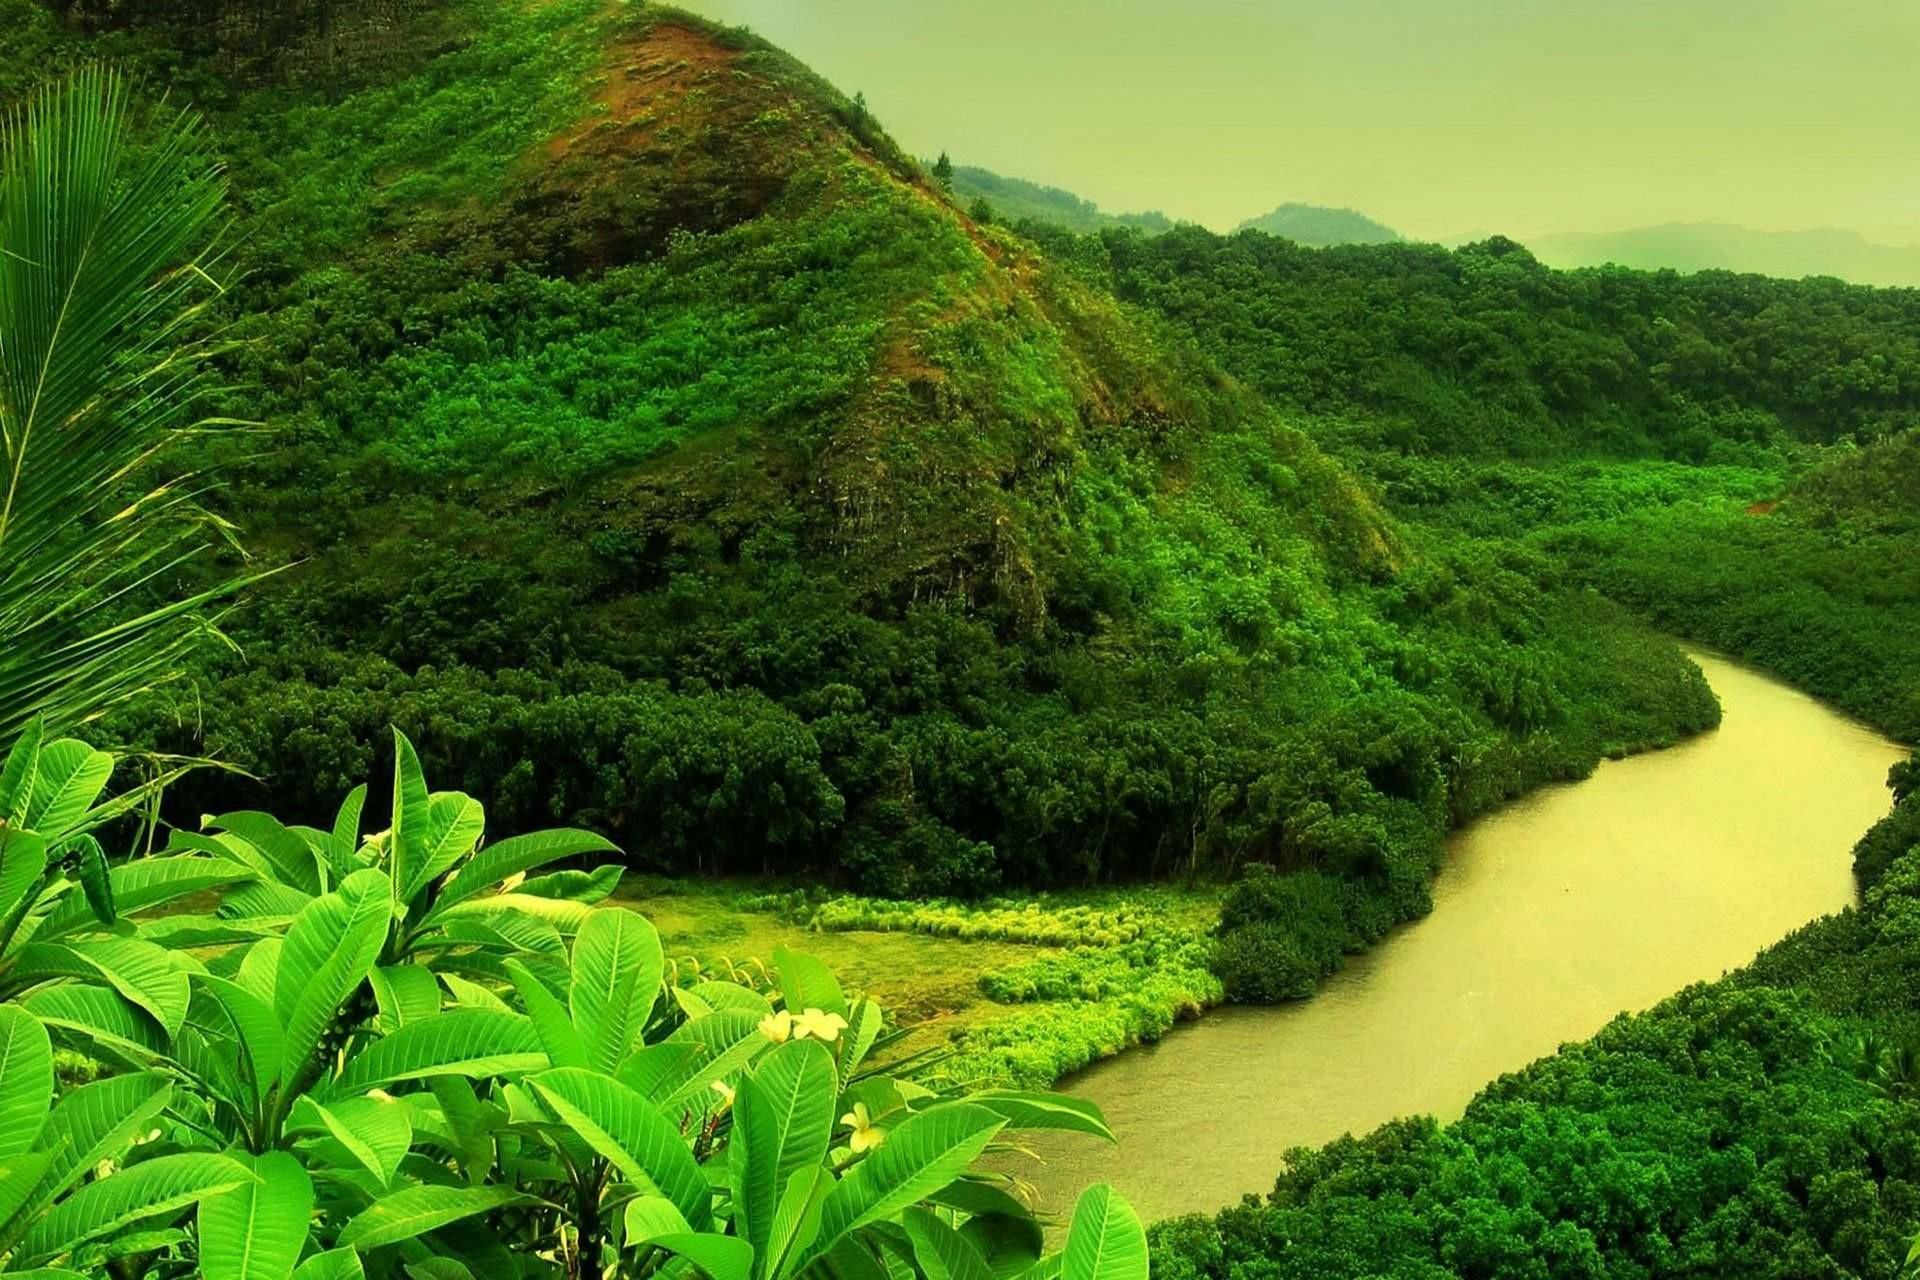 Beautiful Greenery of Real Nature Scene Wallpaper Free Download